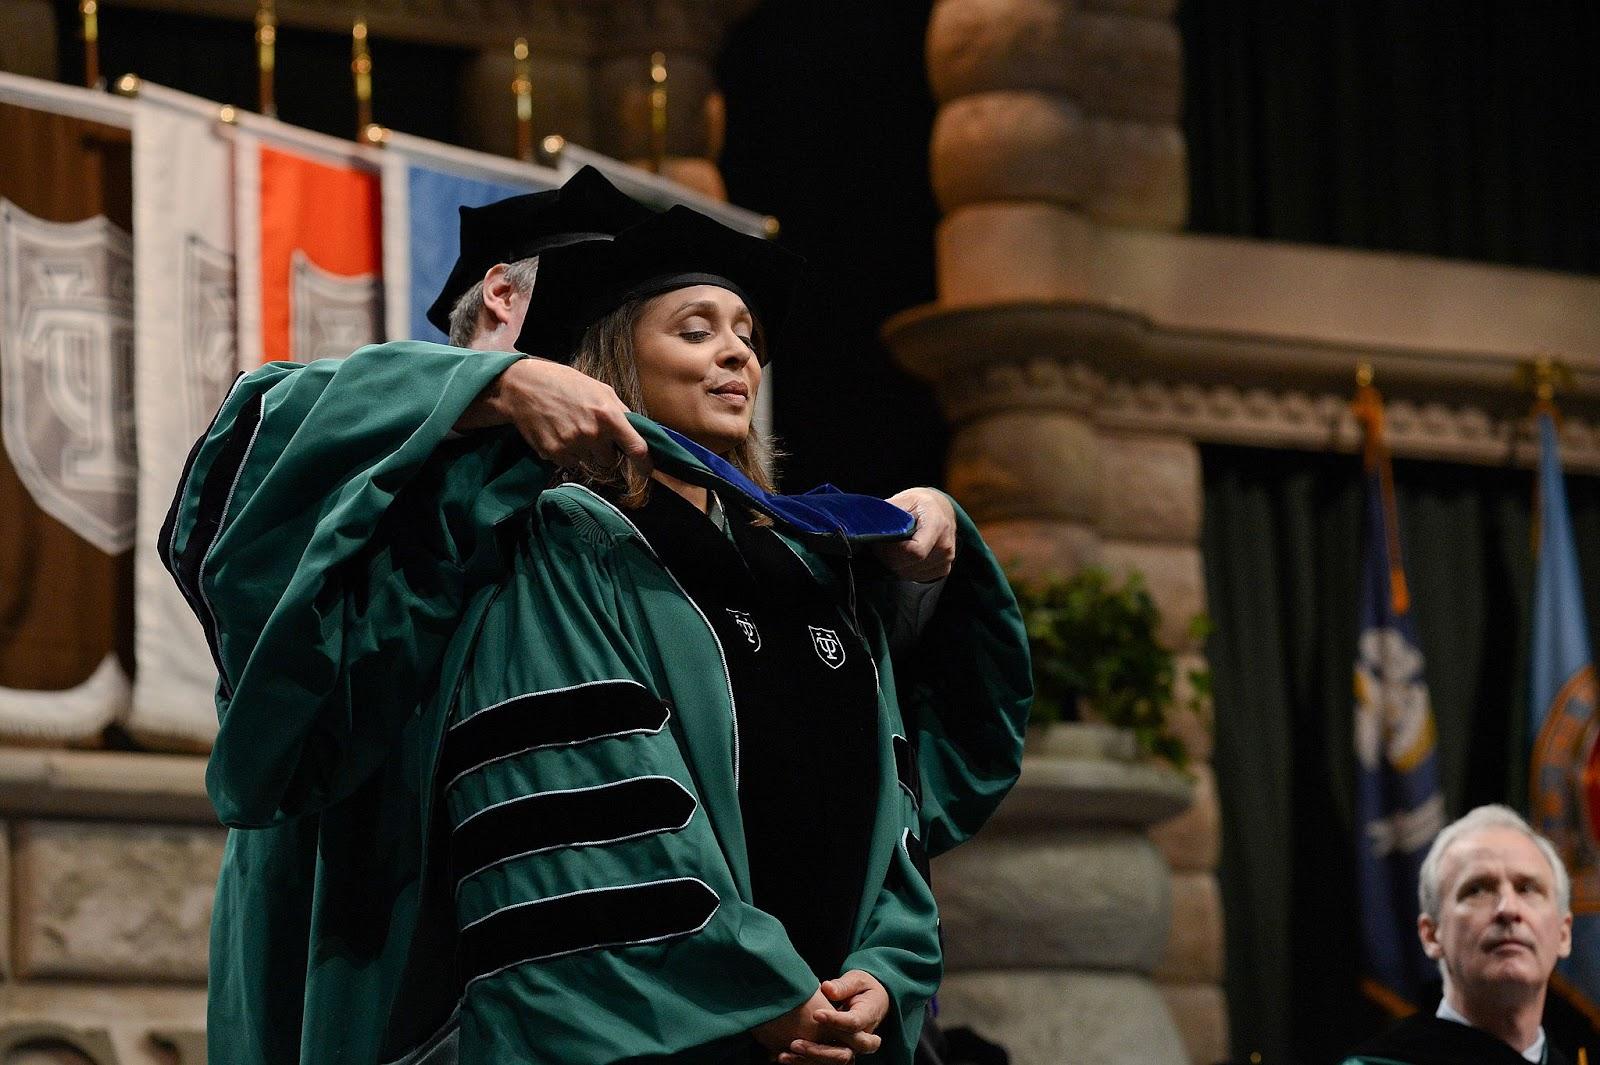 Graduation_2013-196_Natasha_Trethewey_Honorary_Doctorate_Tulane.jpg